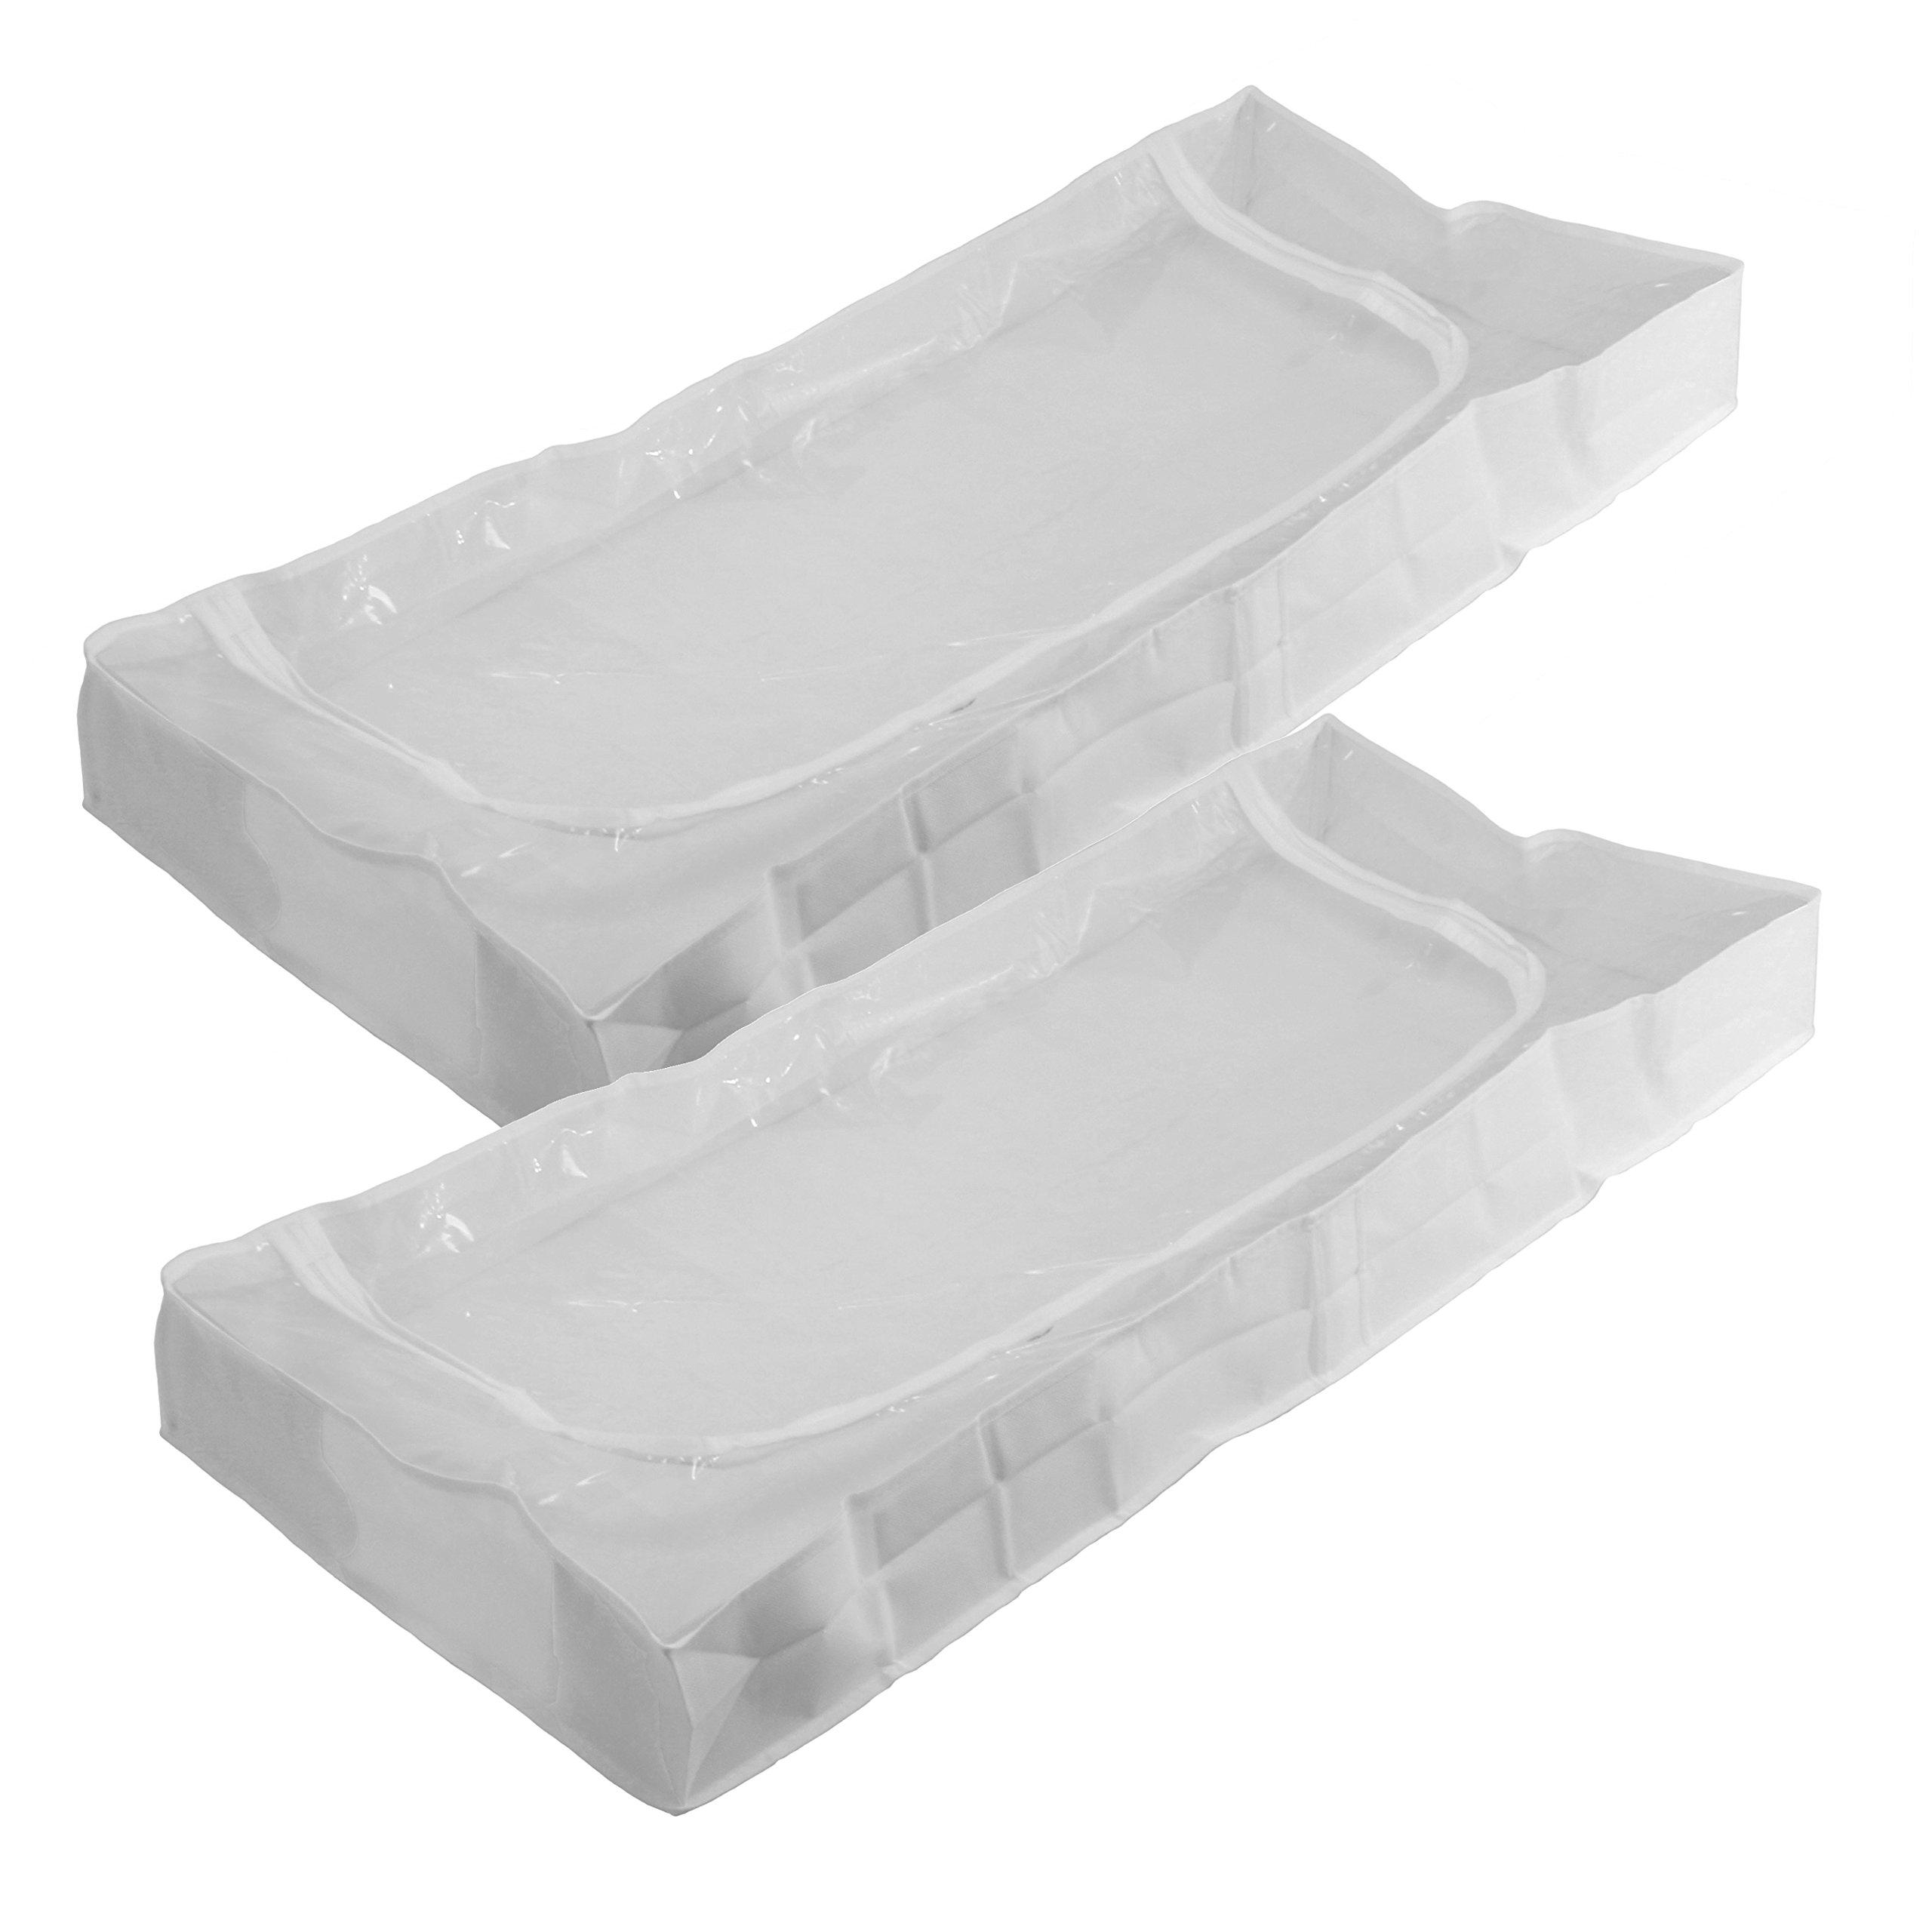 Everyday Essentials Large Underbed Storage Bag - 2 Pack